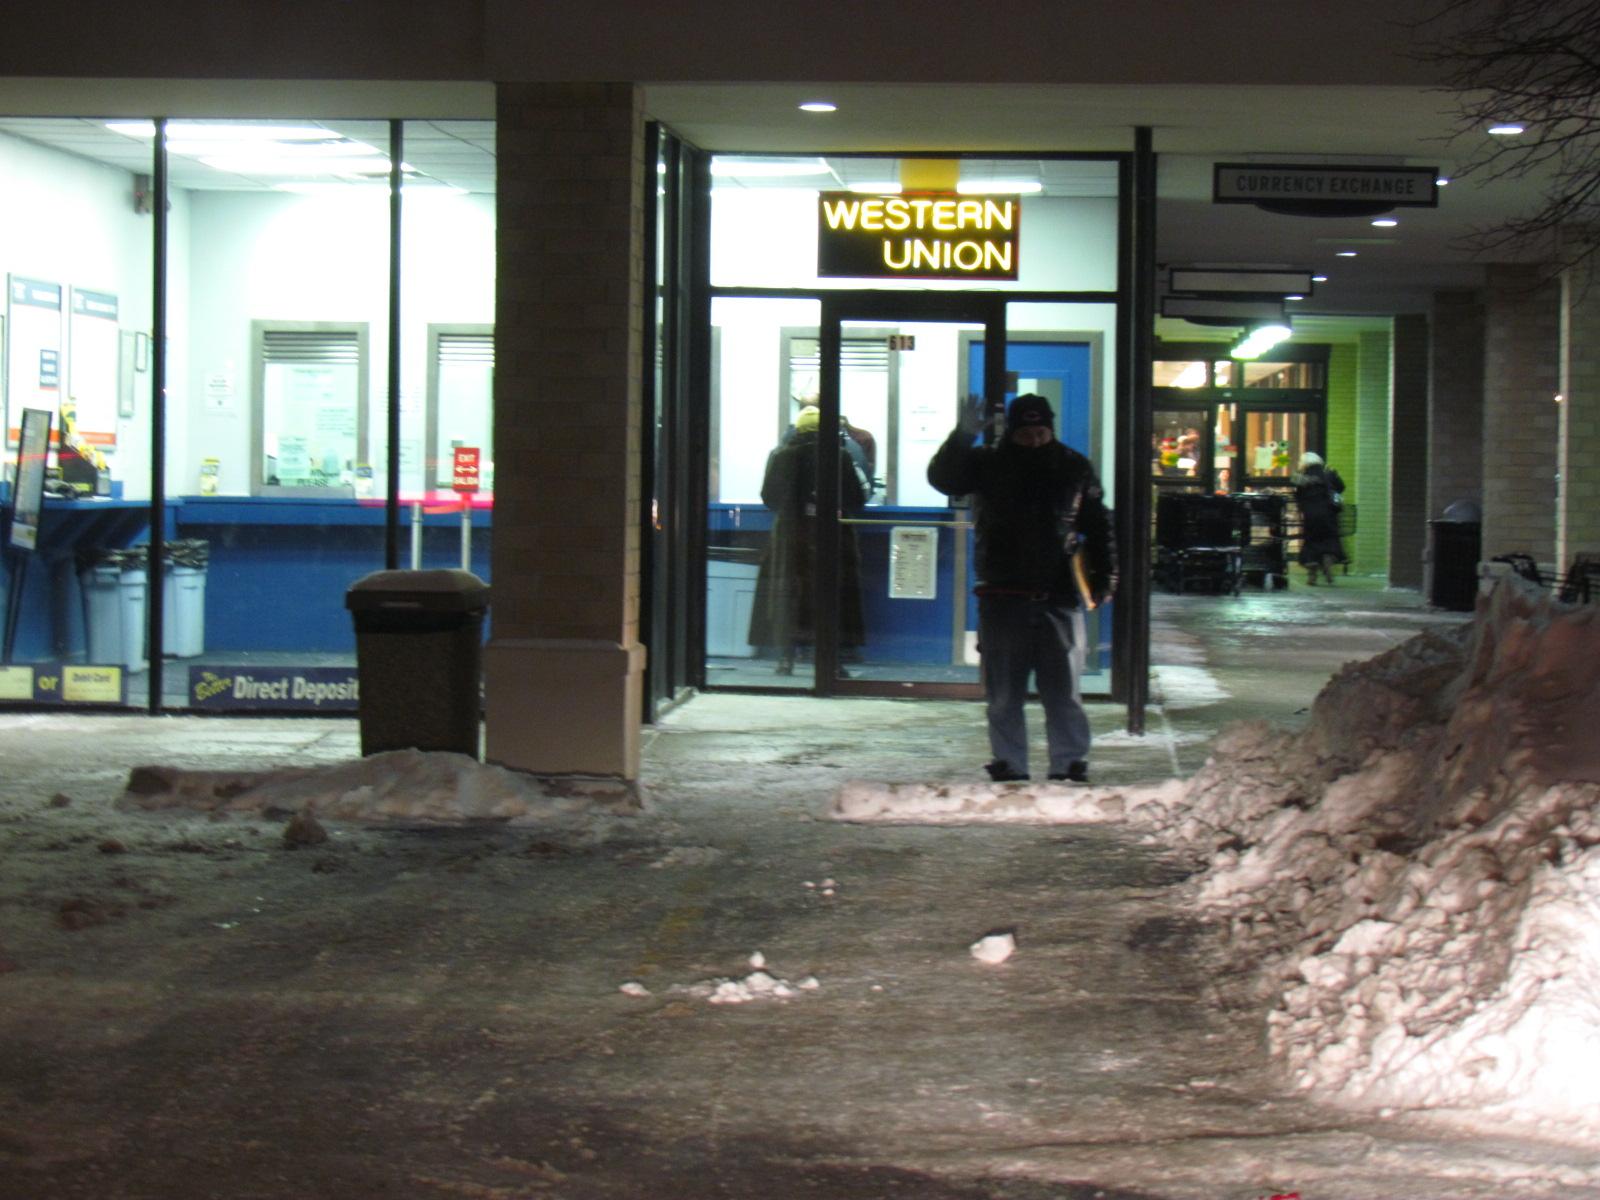 Entering Western Union